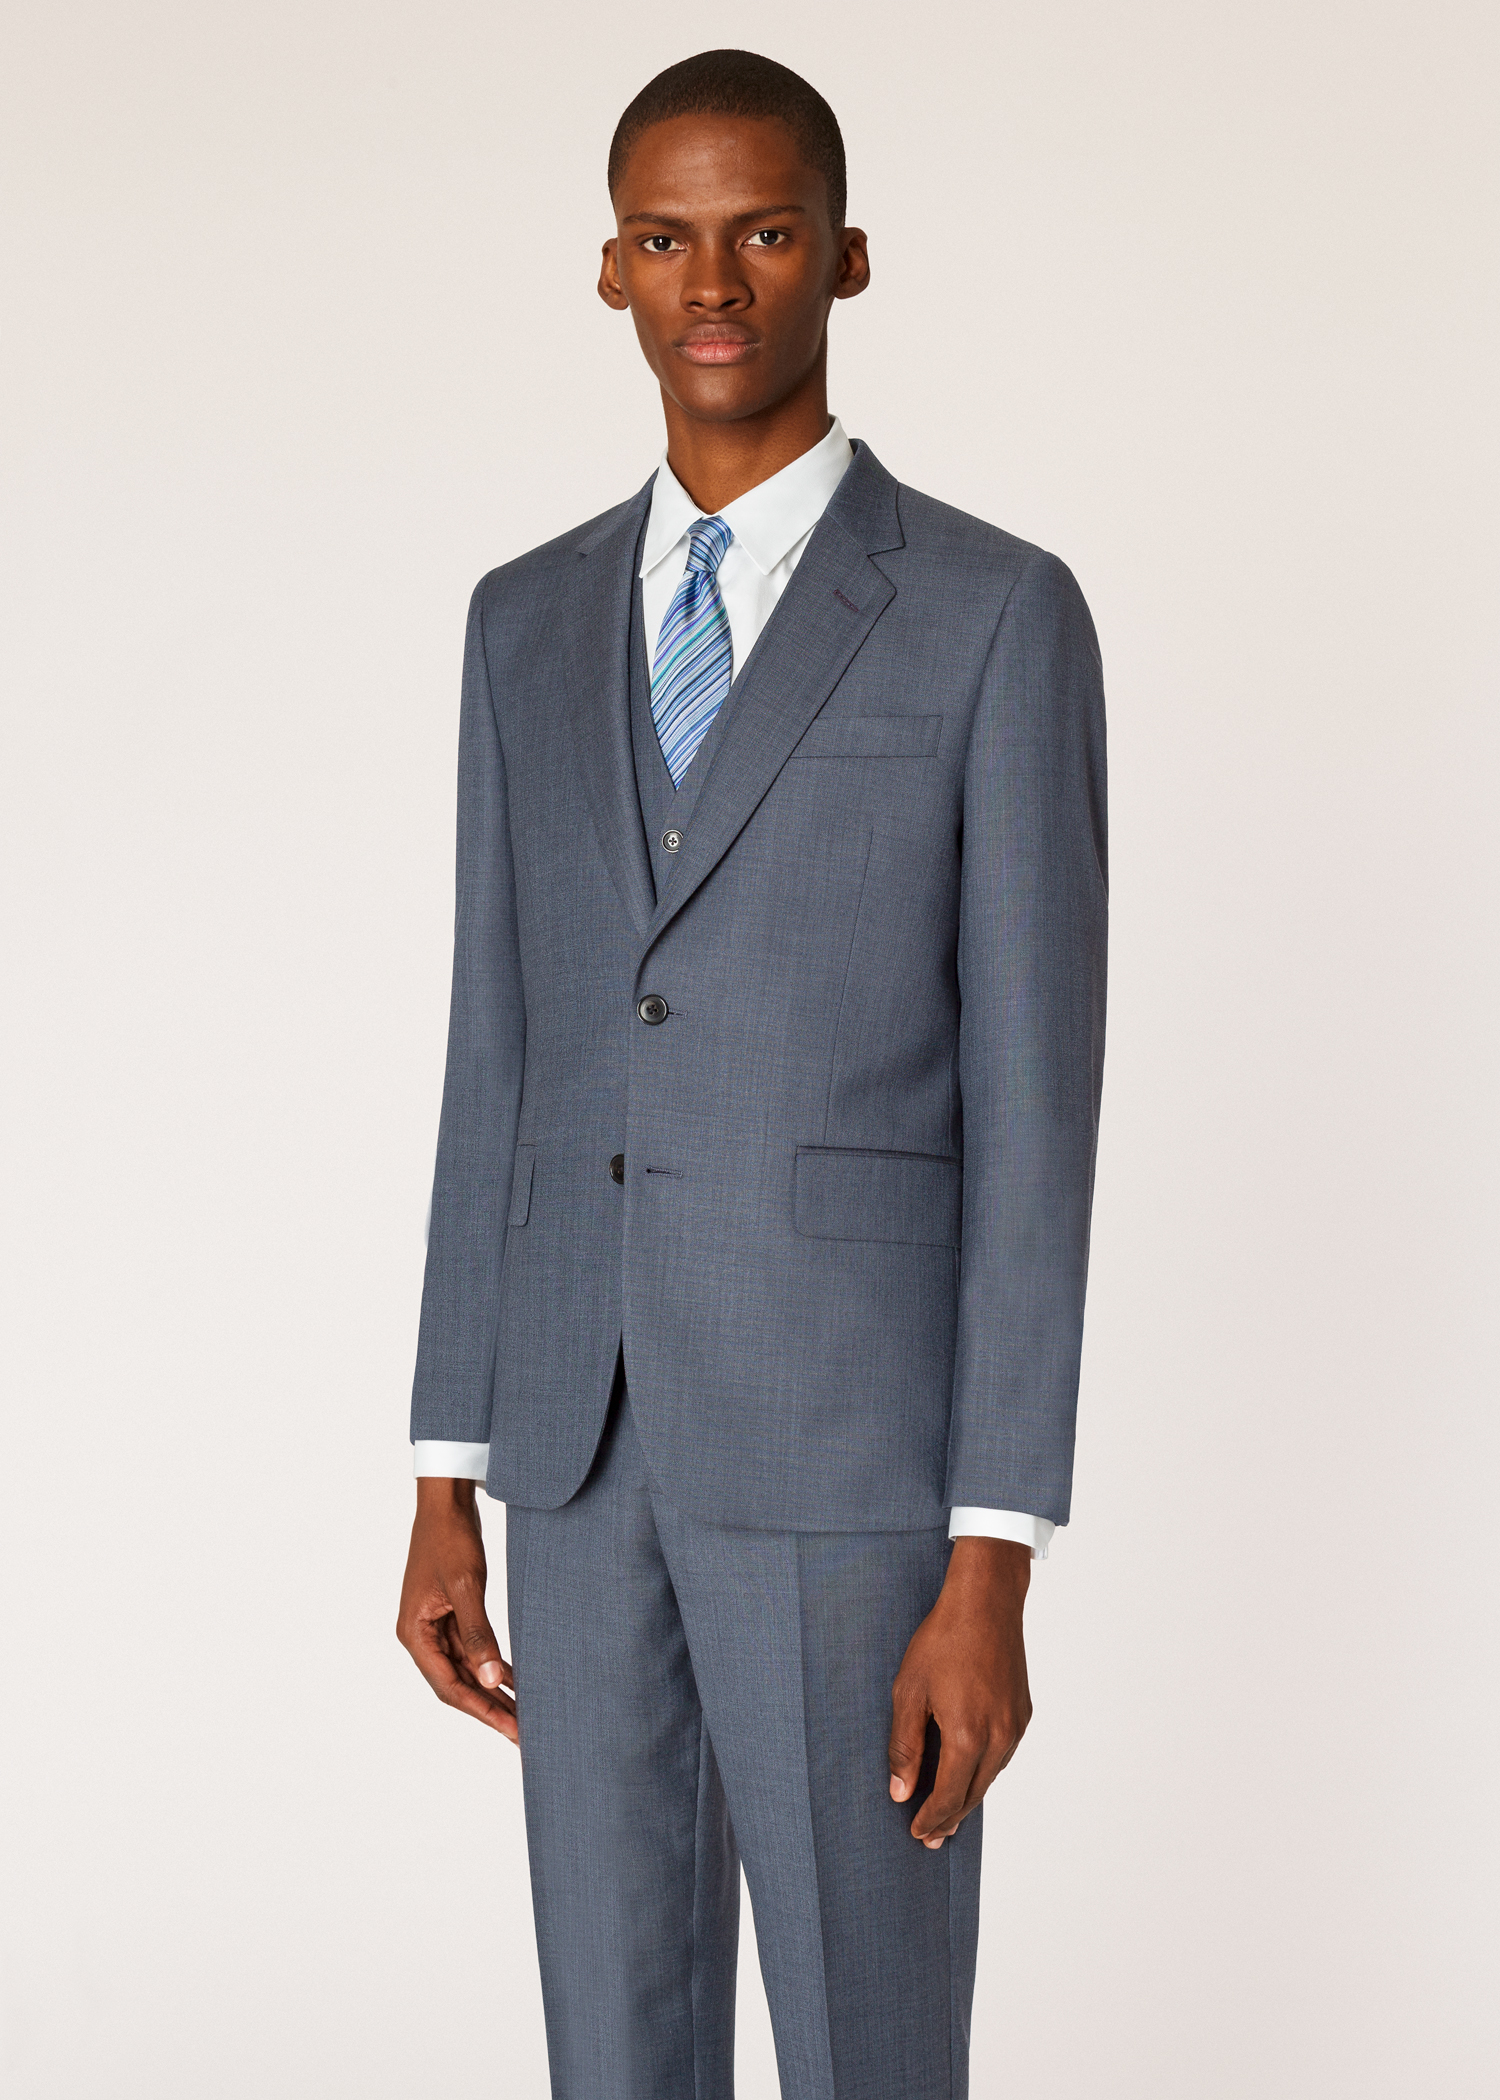 69fcf7e8238 Model front blazer view - The Soho - Men's Tailored-Fit Dark Grey Three-